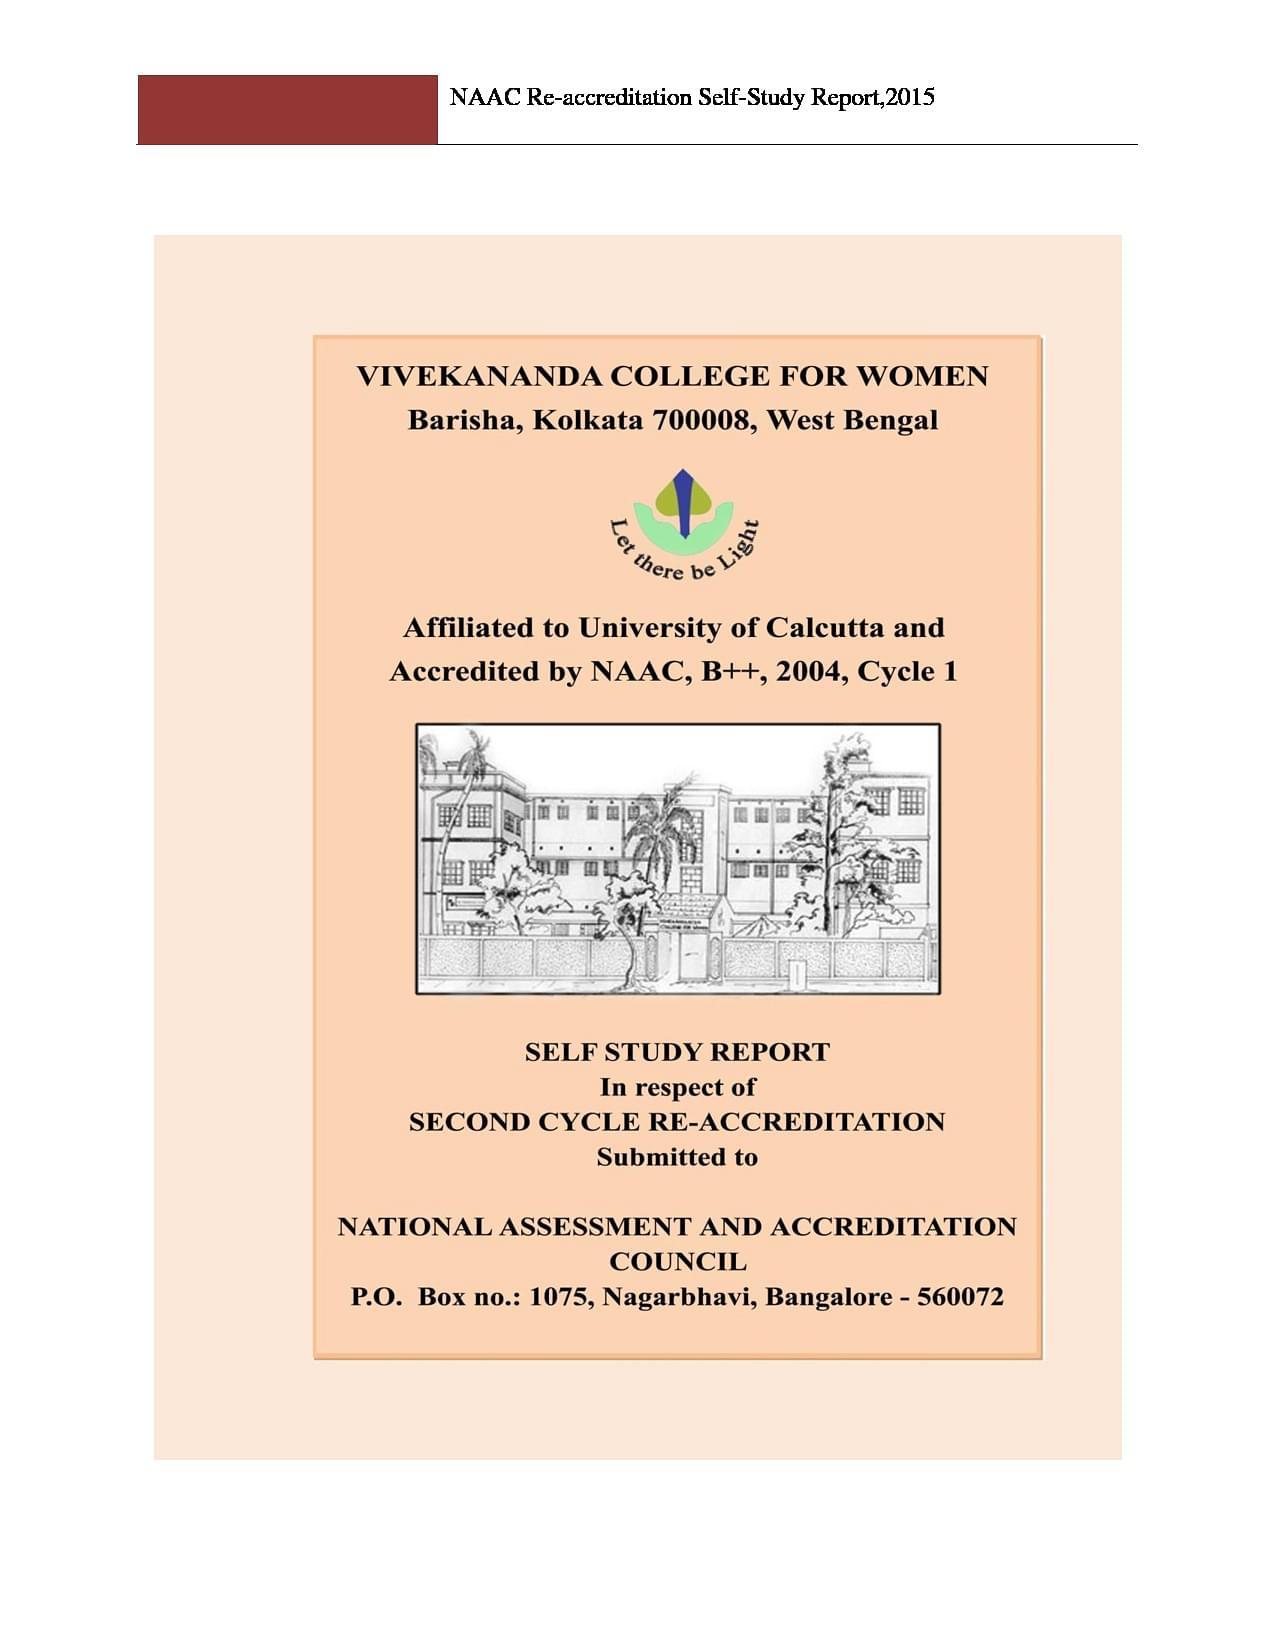 Accreditation Self-Study Report - calbaptist.edu